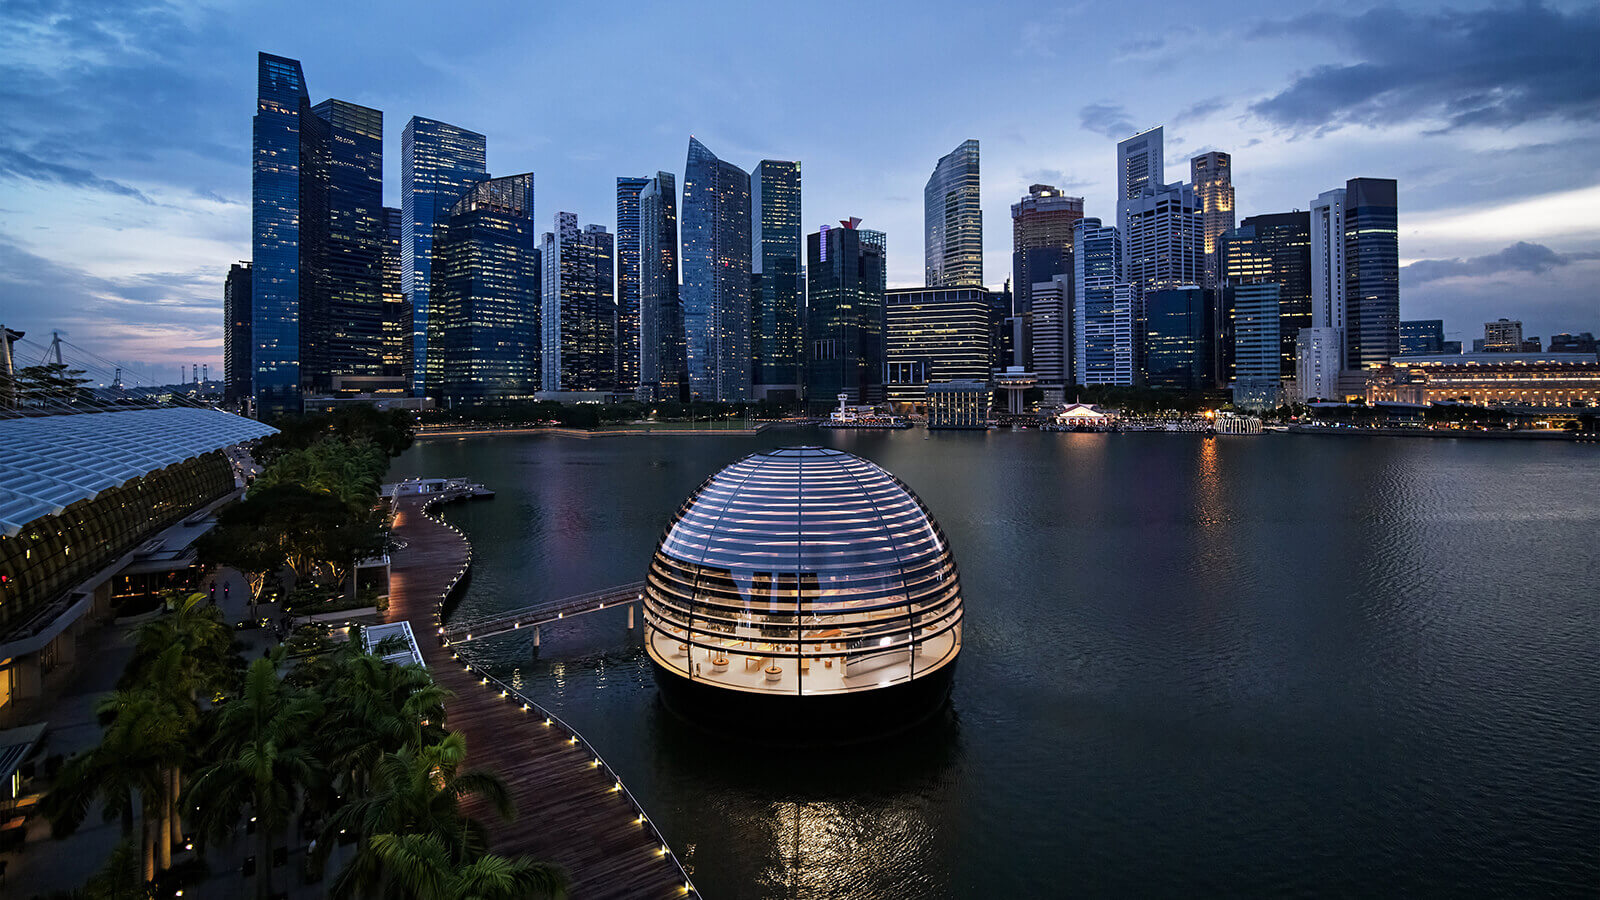 Apple NSO Marina Bay Sands store, Singapore